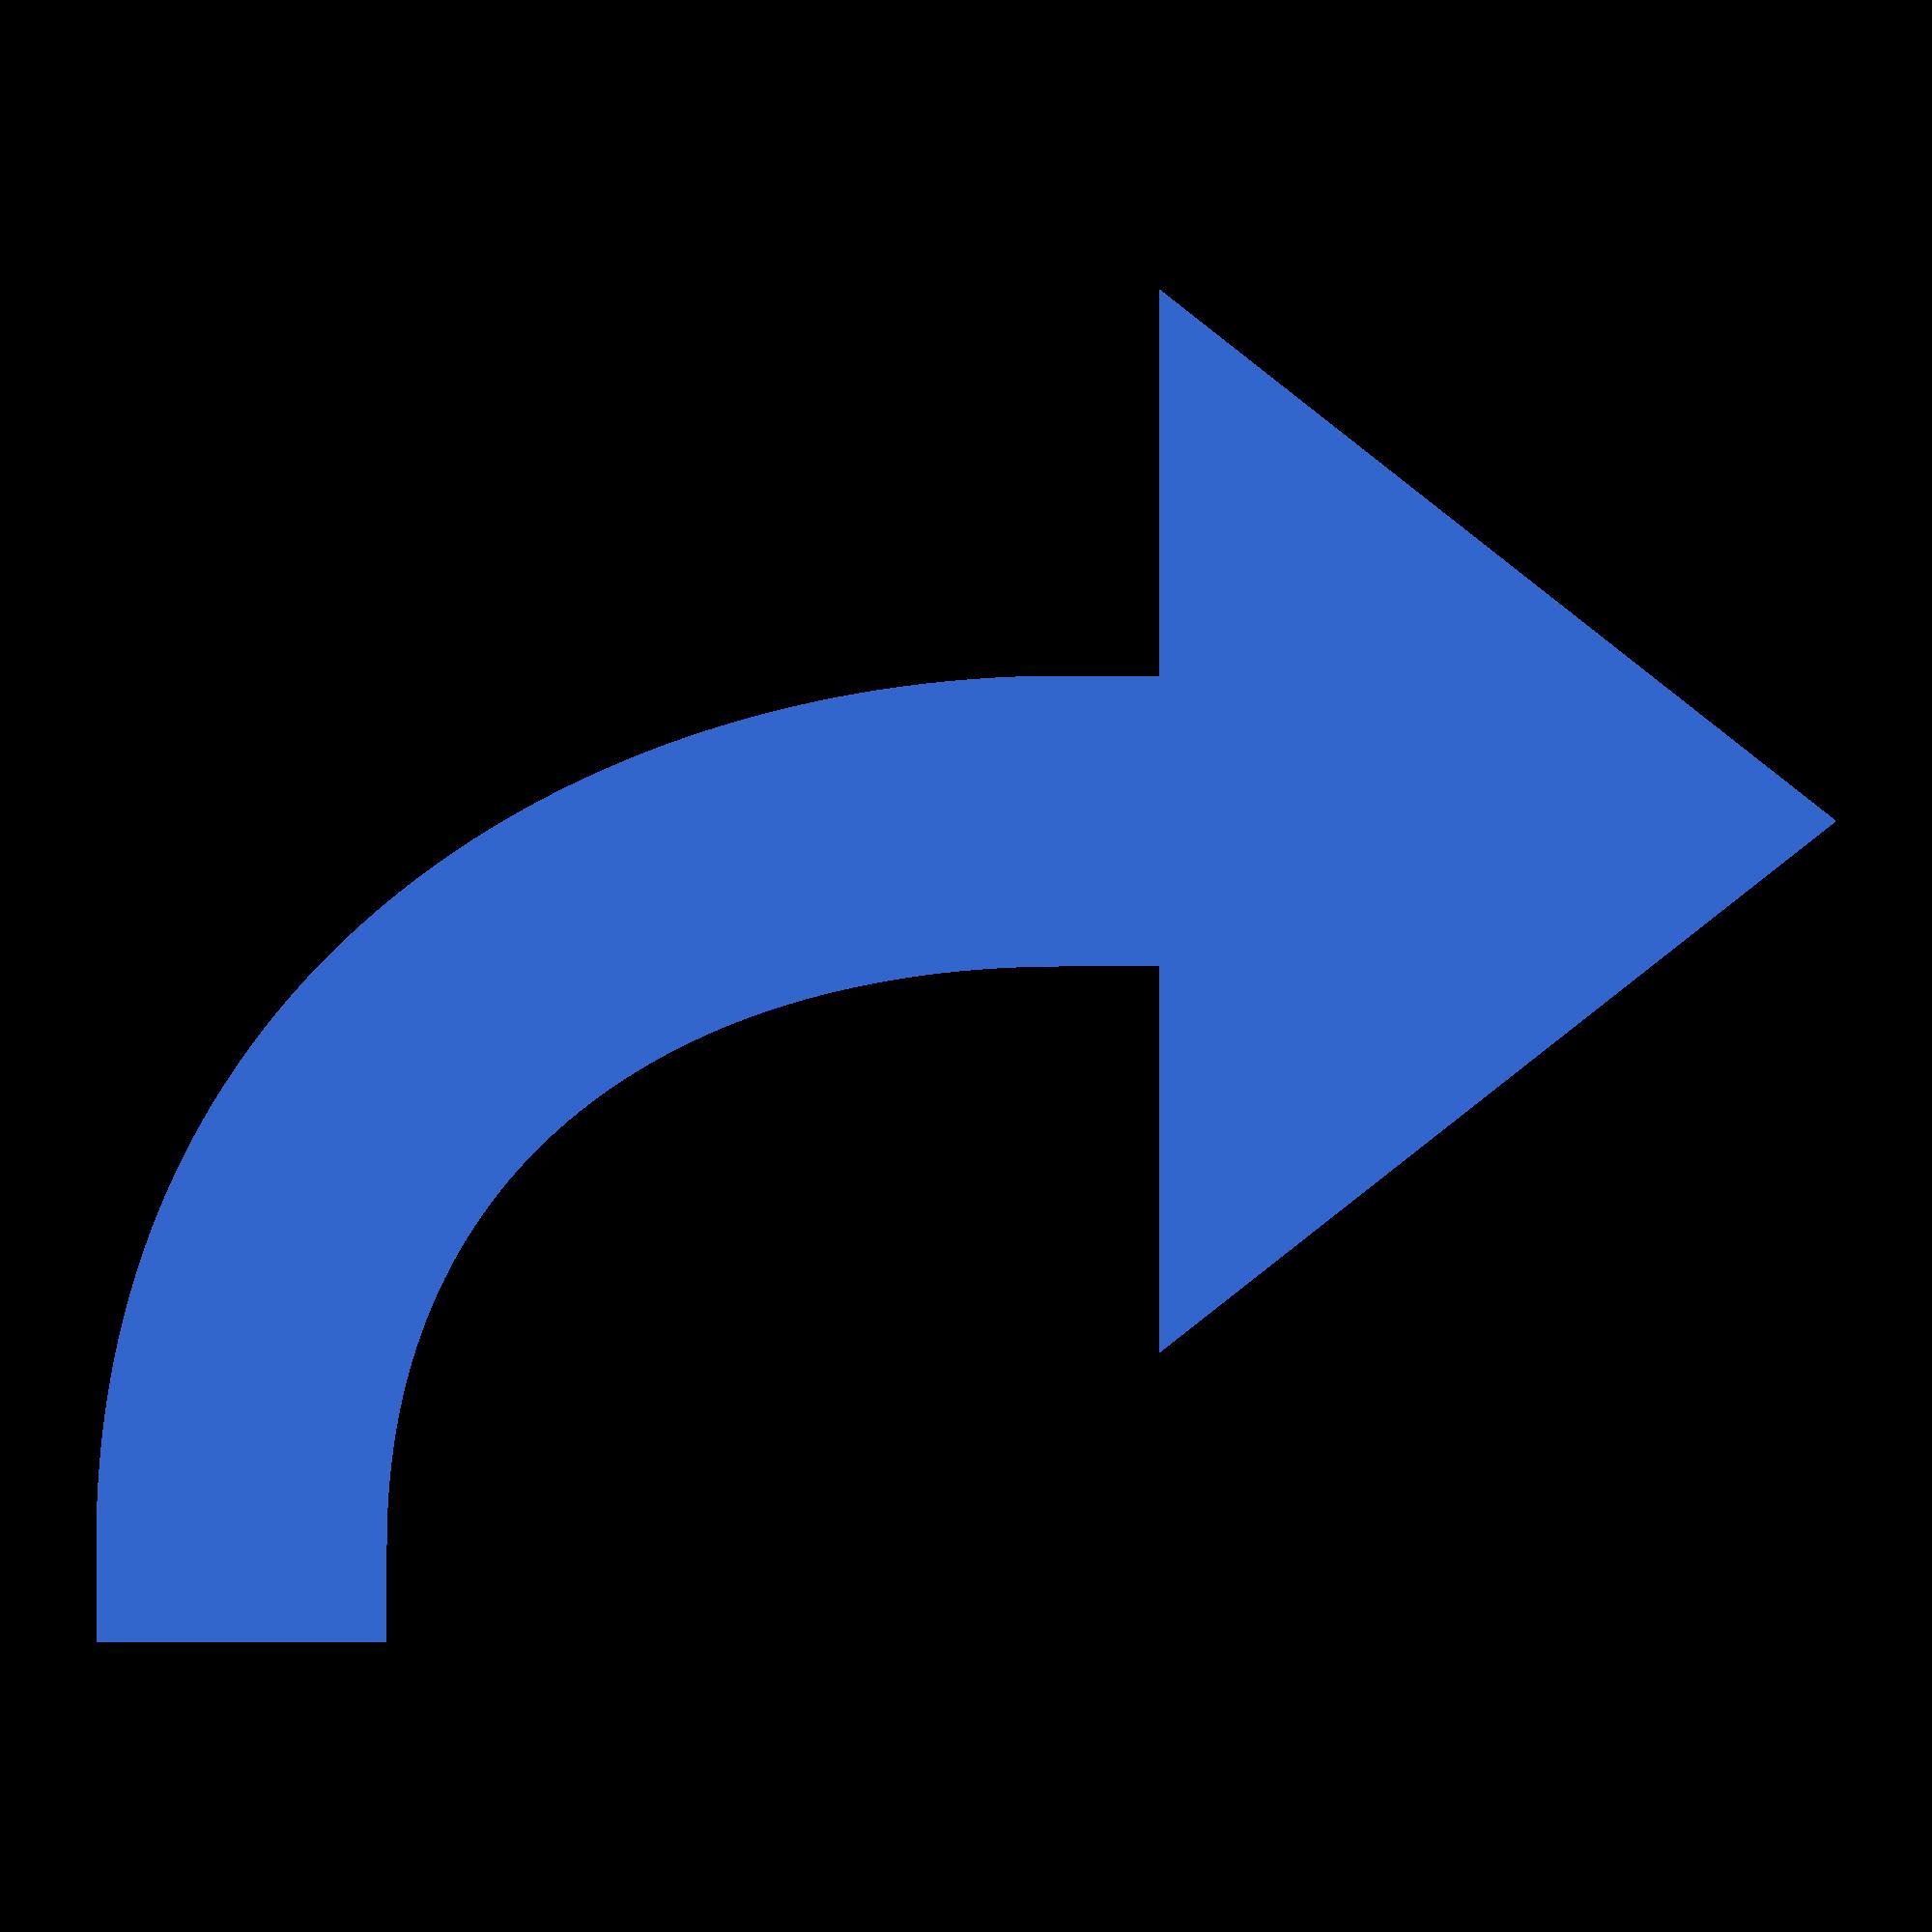 clipart transparent stock svg src arrow #104366661